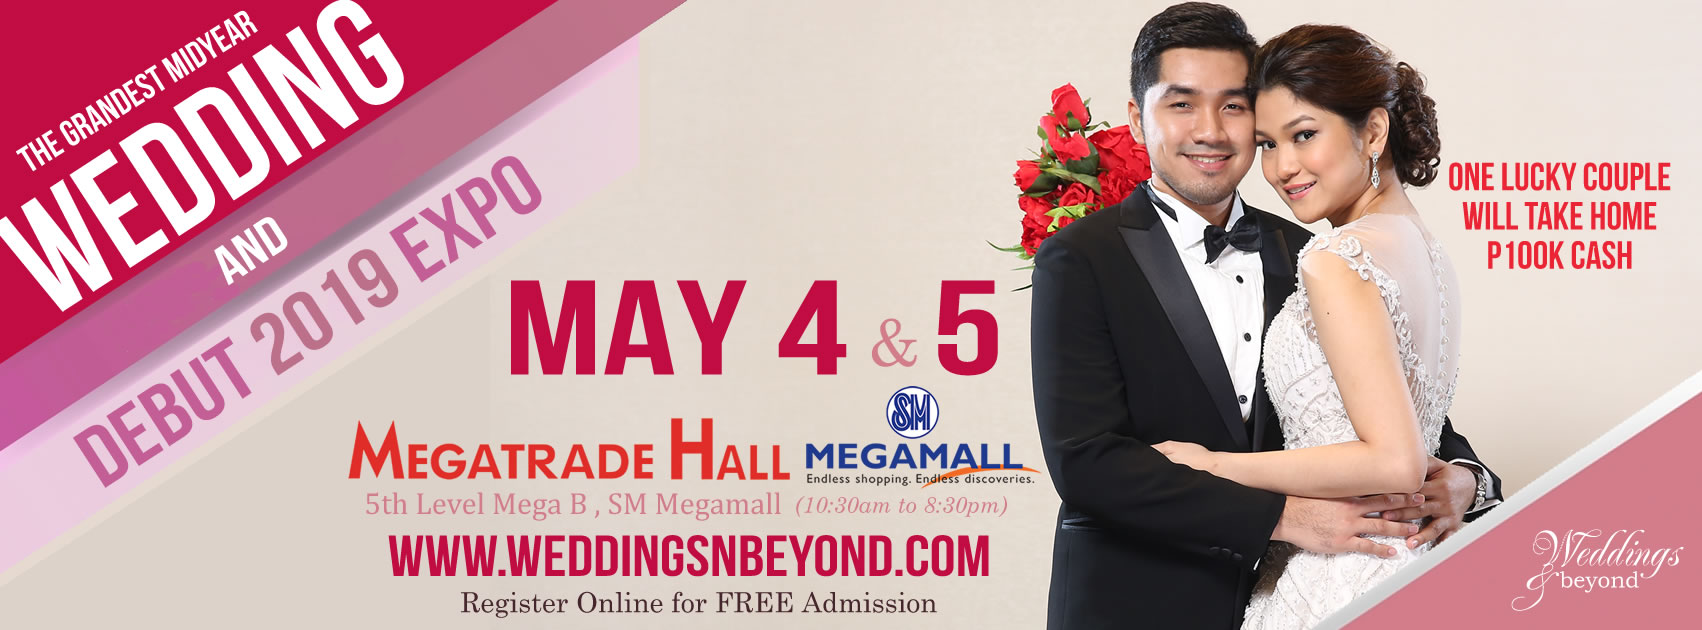 THE GRANDEST MIDYEAR WEDDING & DEBUT EXPO